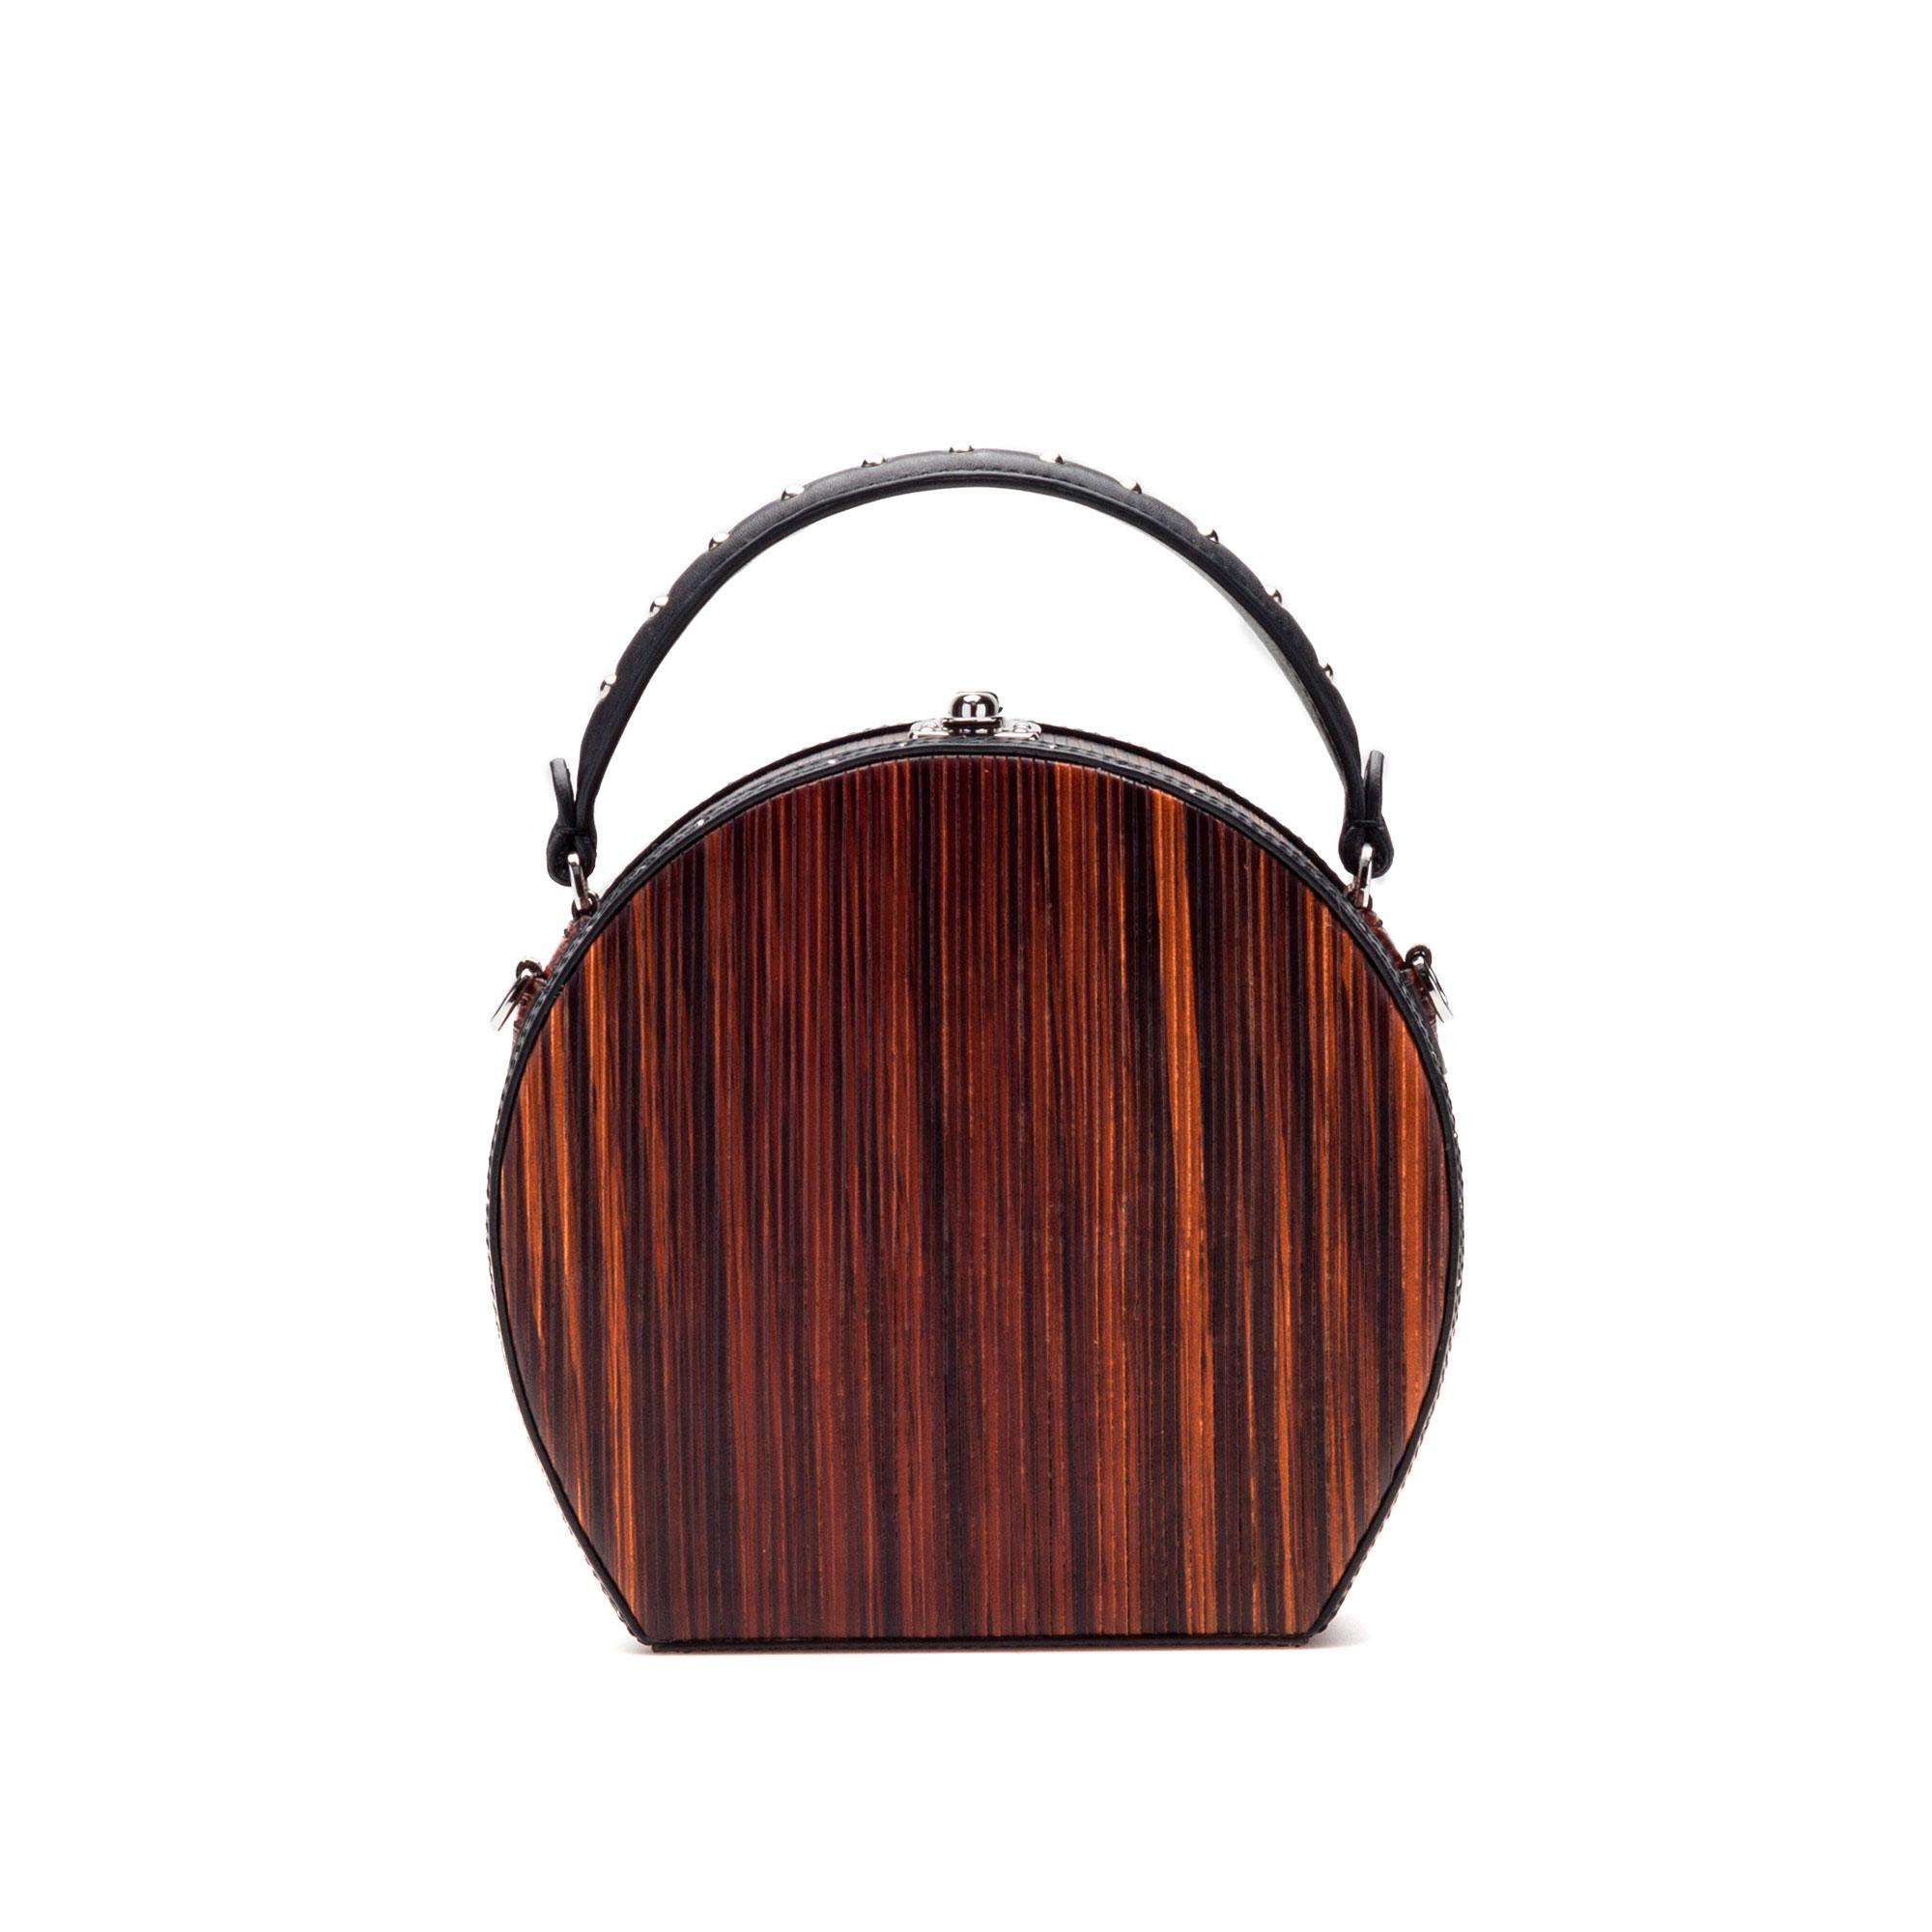 The wood effect french calf and wood leather Regular Bertoncina bag by Bertoni 1949 01